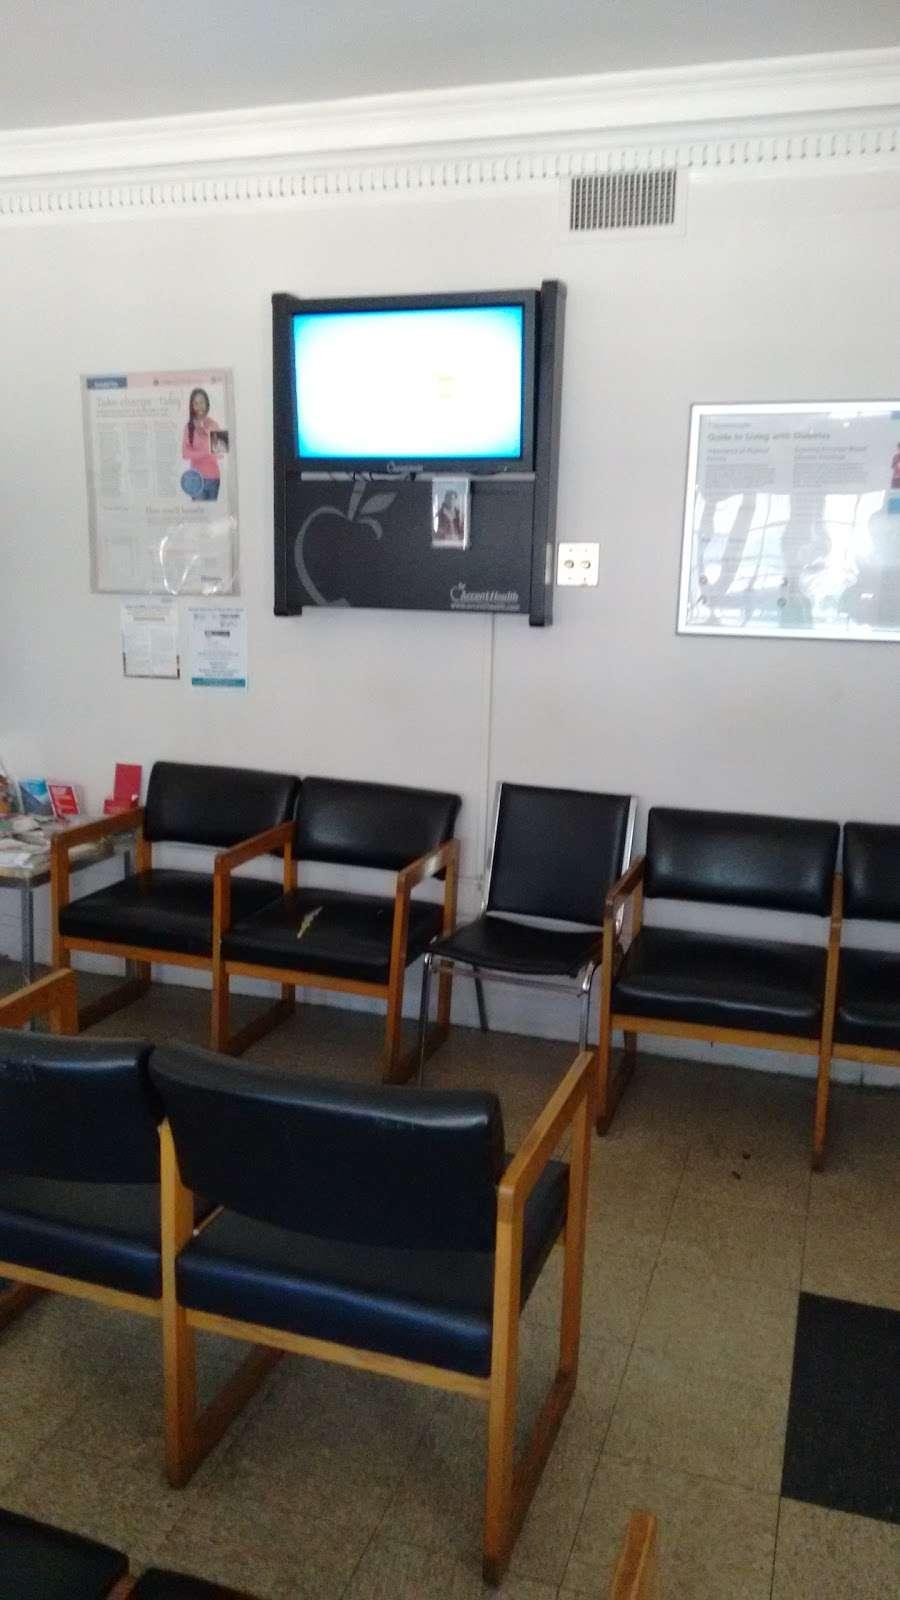 Ocean Family Care Center - health  | Photo 1 of 2 | Address: 622 Ocean Ave, Brooklyn, NY 11226, USA | Phone: (718) 693-2800